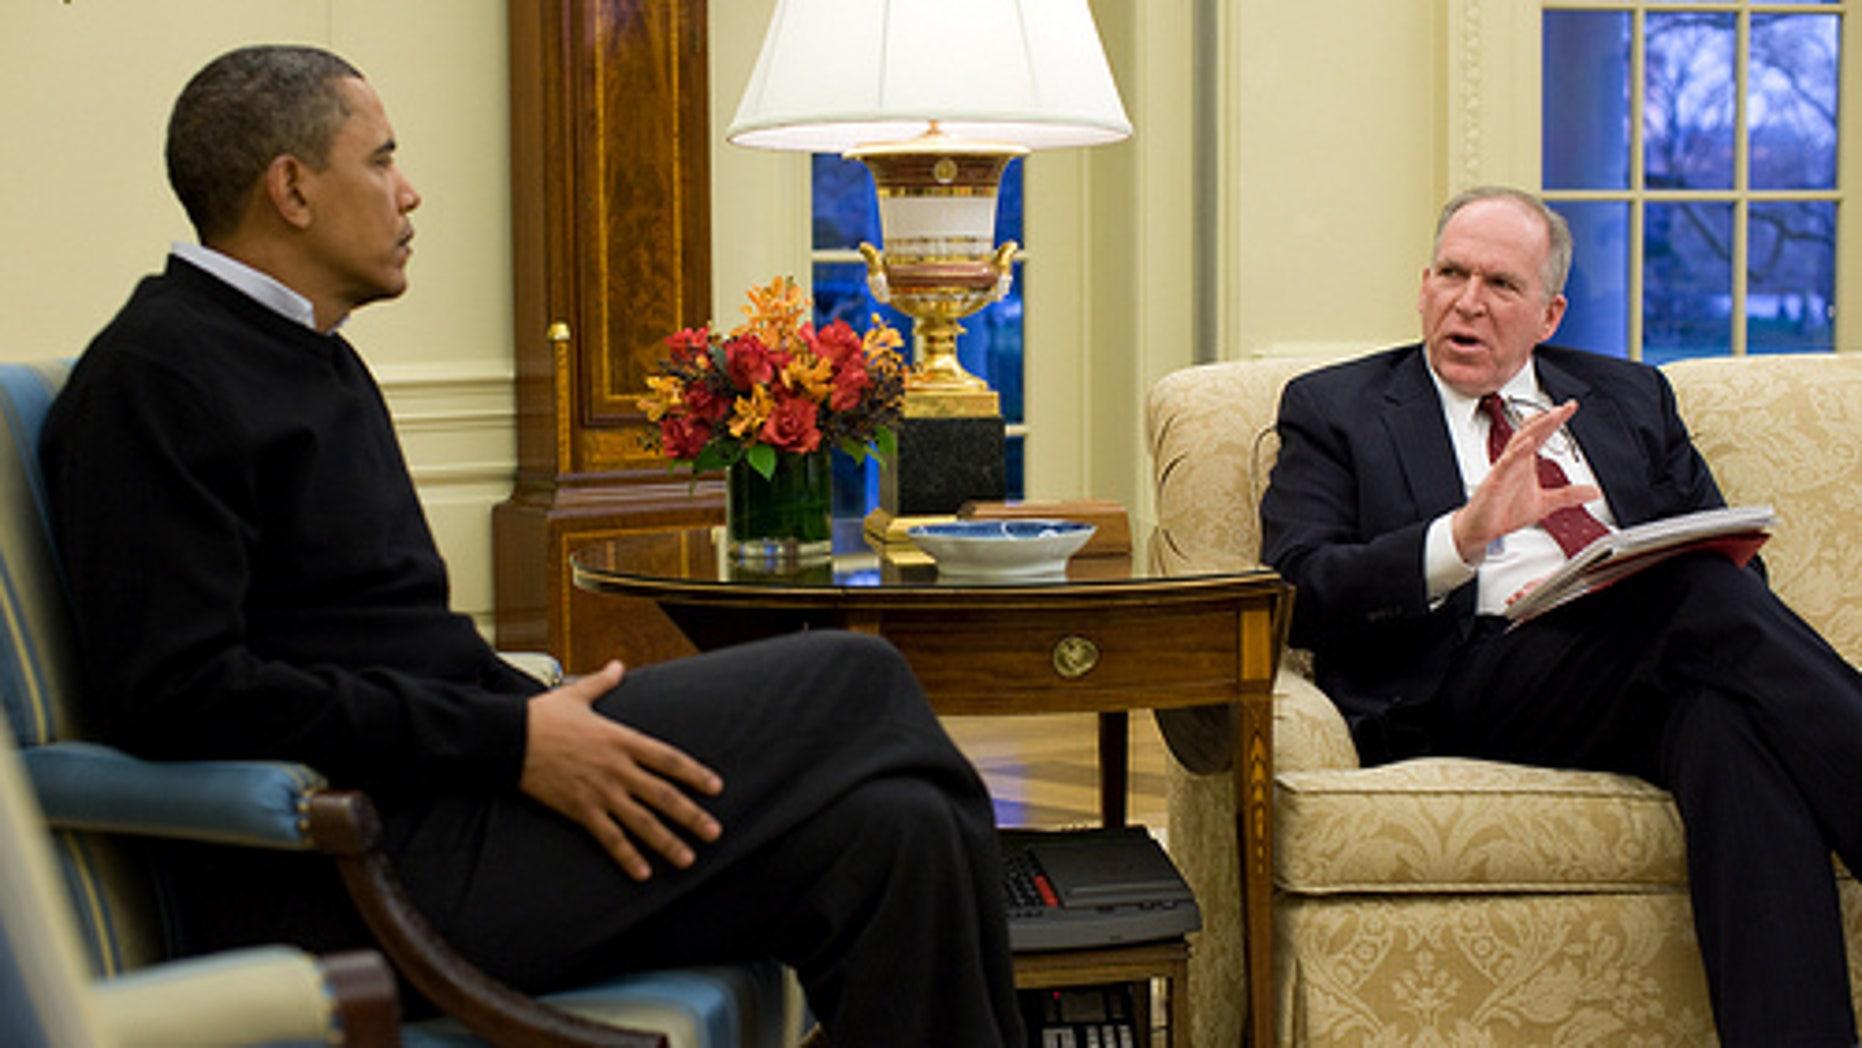 White House Photo/Pete Souza